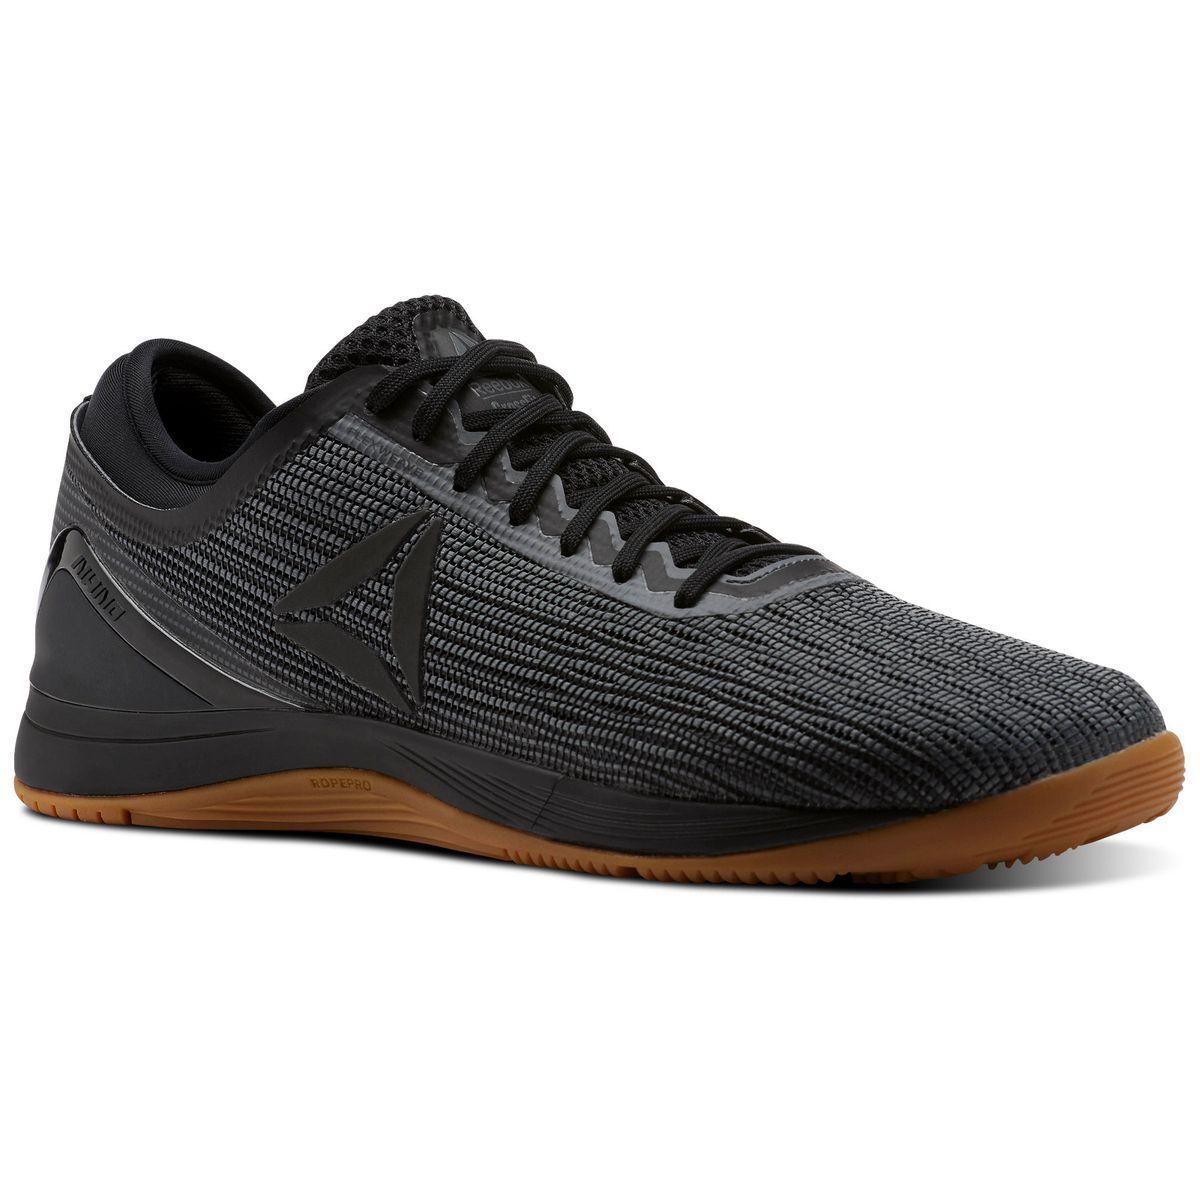 Épinglé par Atanganasylvestrej sur Baskets | Chaussures de